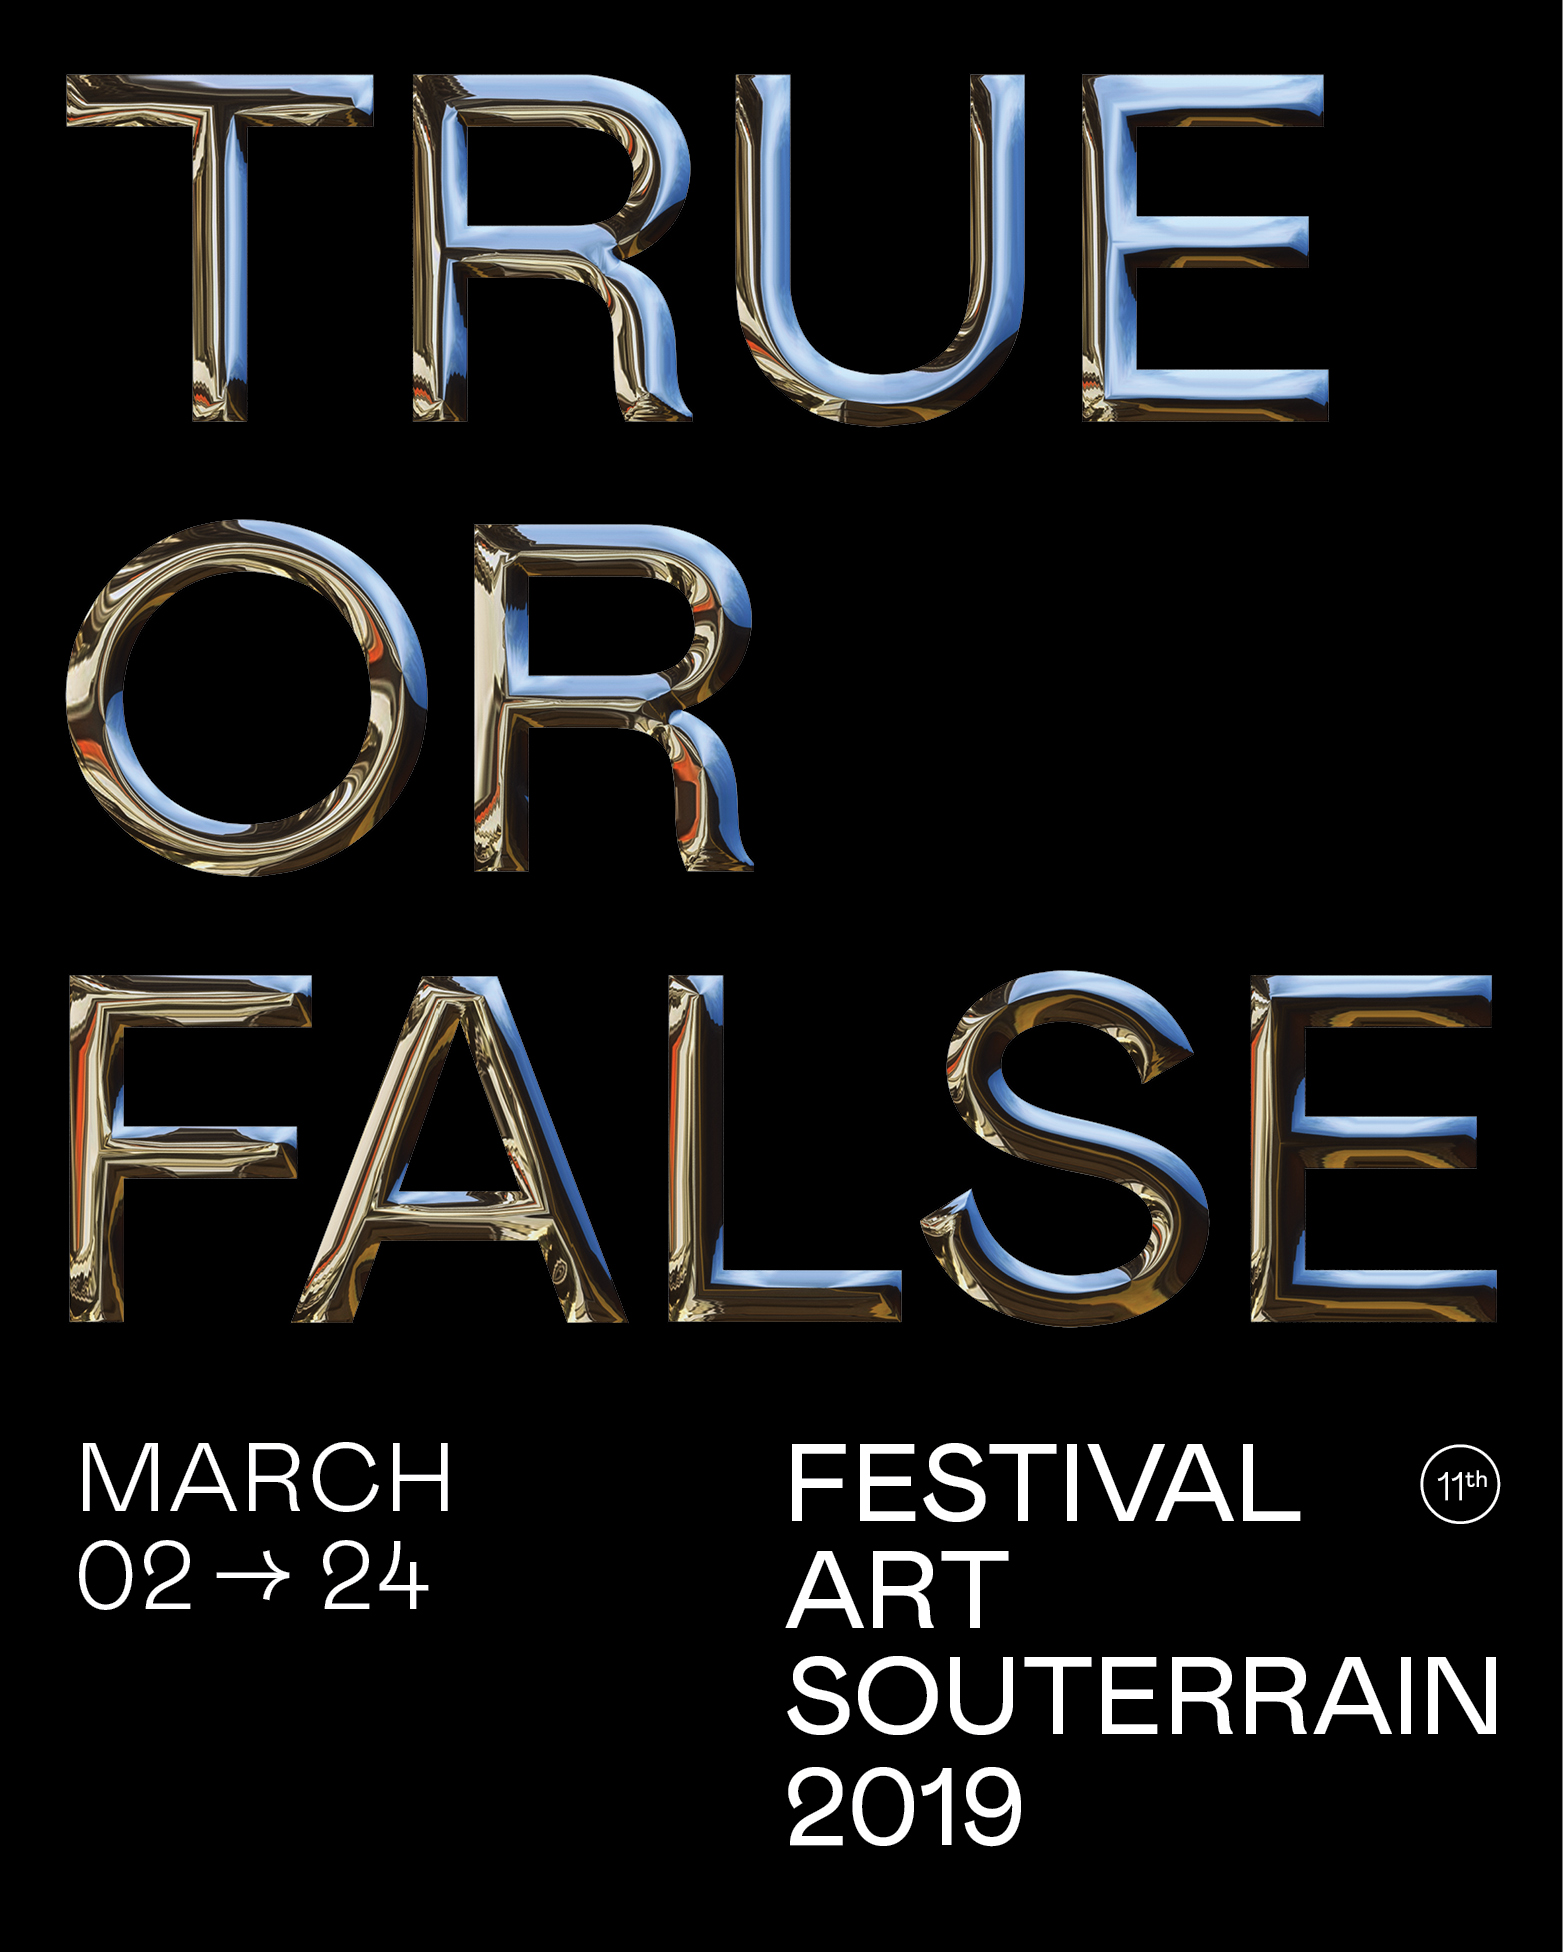 Festival Art Souterrain 2019 - March 2 to 24 - True or False